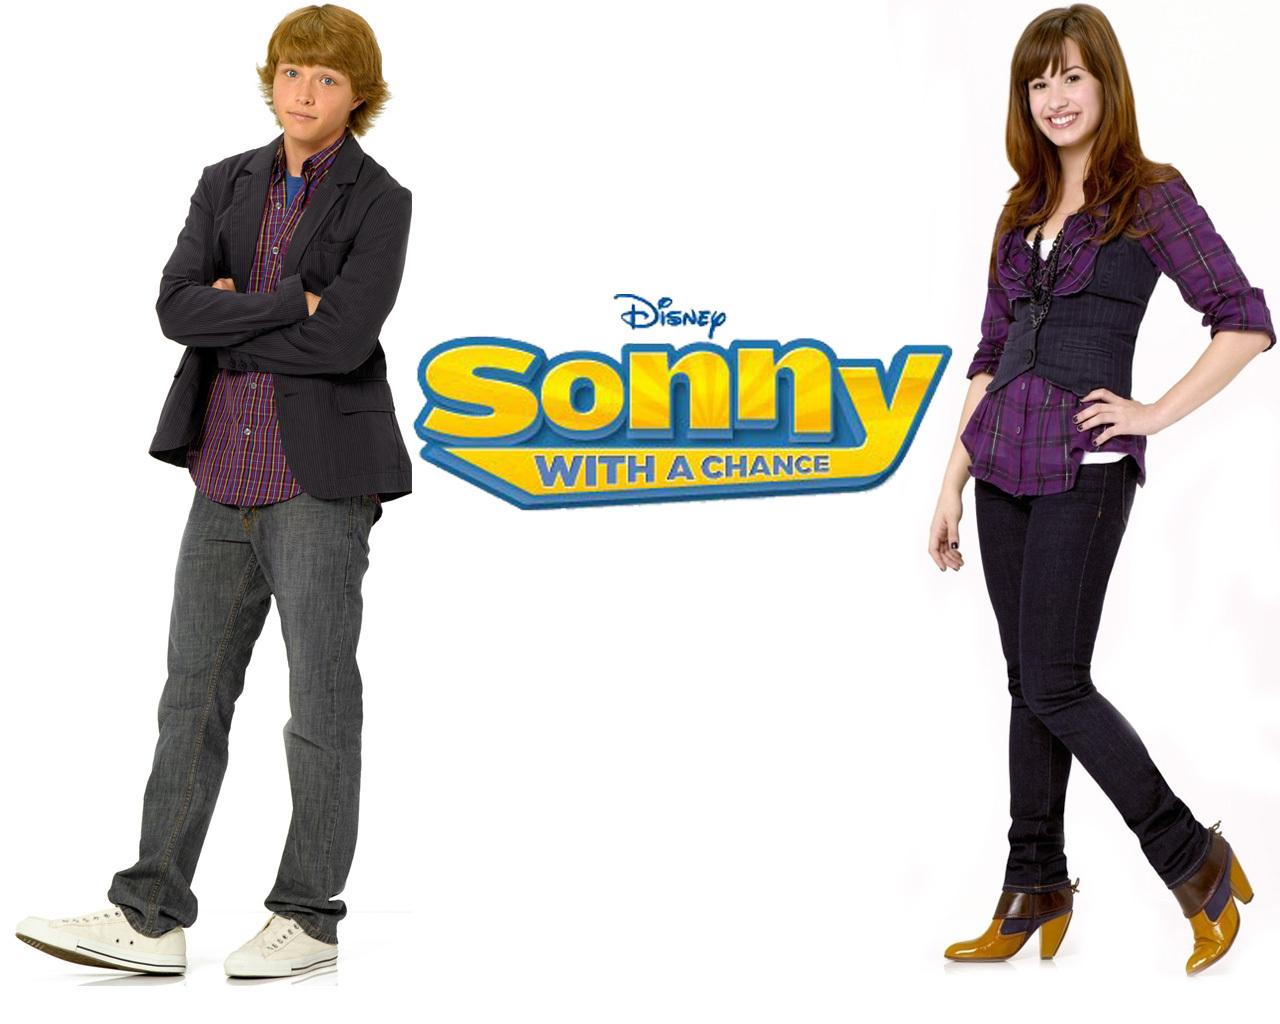 http://3.bp.blogspot.com/_wf8kvgf0qBE/TQ-BFnwrAgI/AAAAAAAAAPk/flR-shcDUz8/s1600/Sonny-with-a-chance-DEMI-LOVATO-sonny-with-a-chance-9421414-1280-1024.jpg